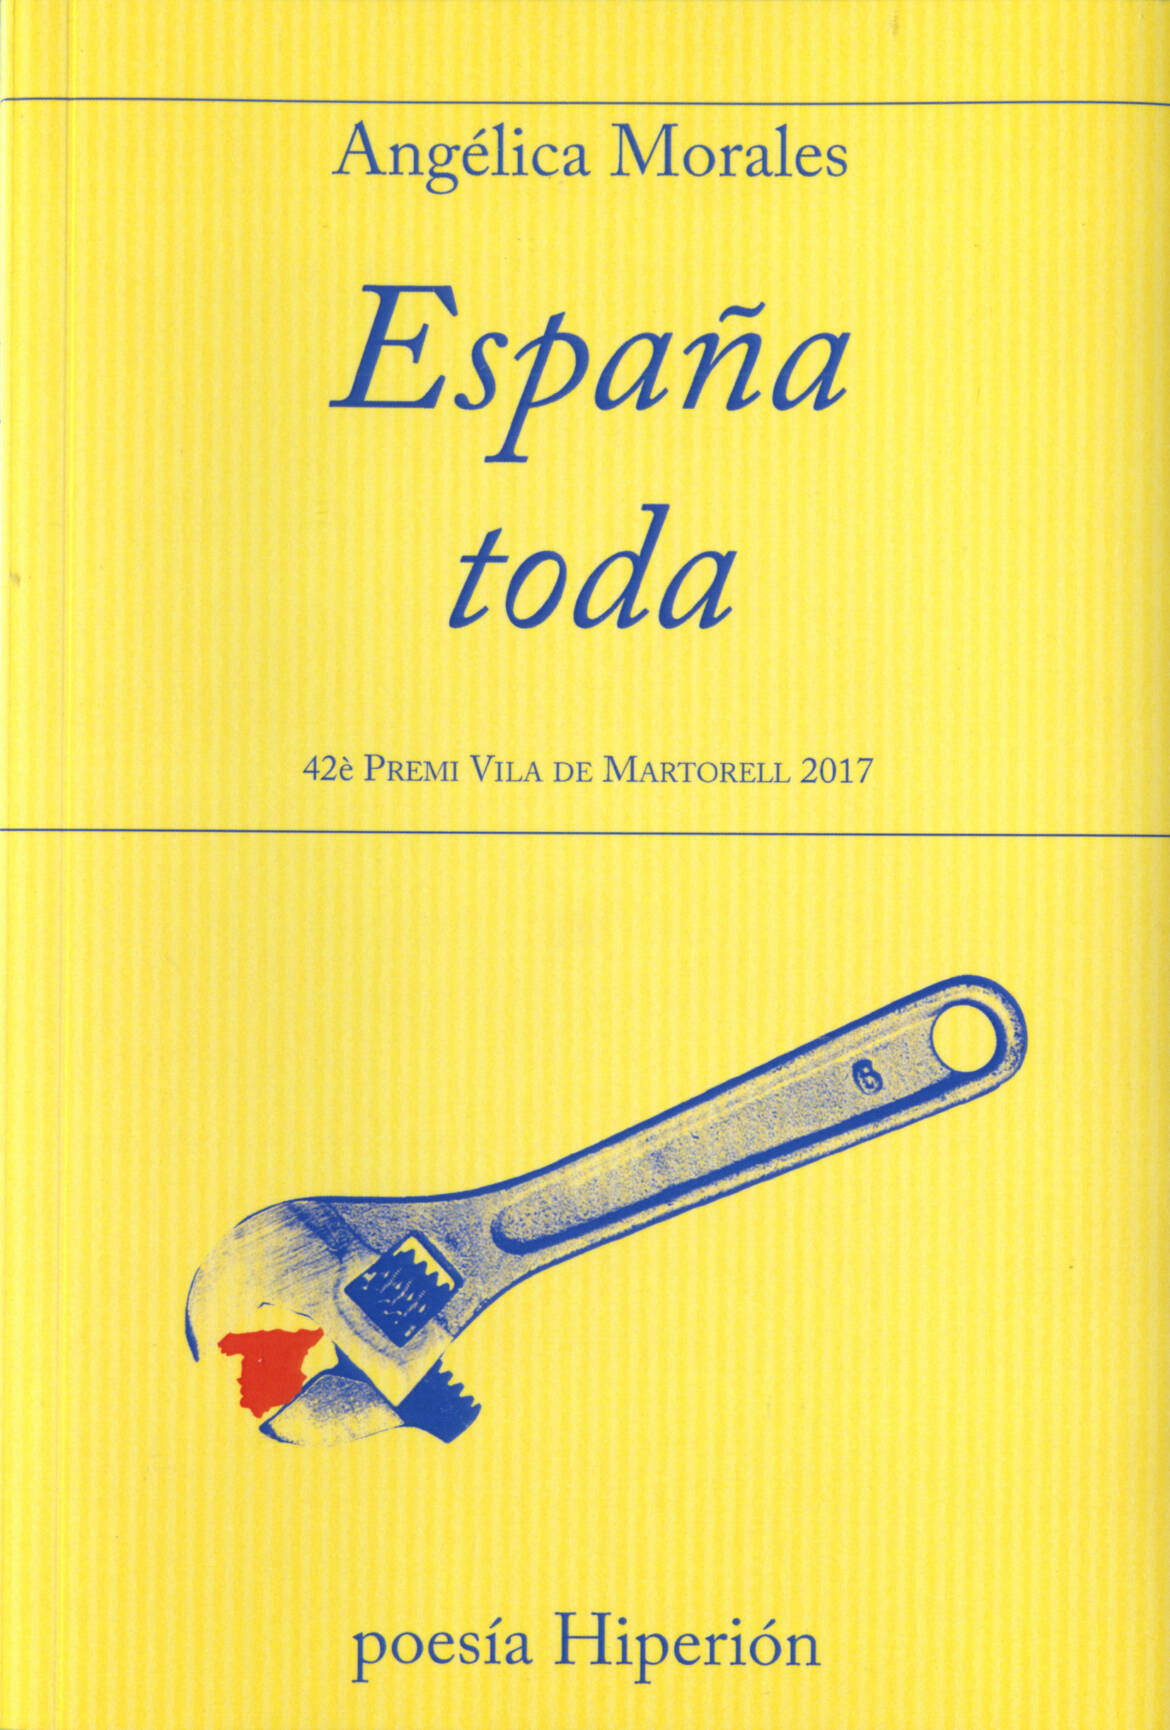 734-morales-espana.txiki_.jpg